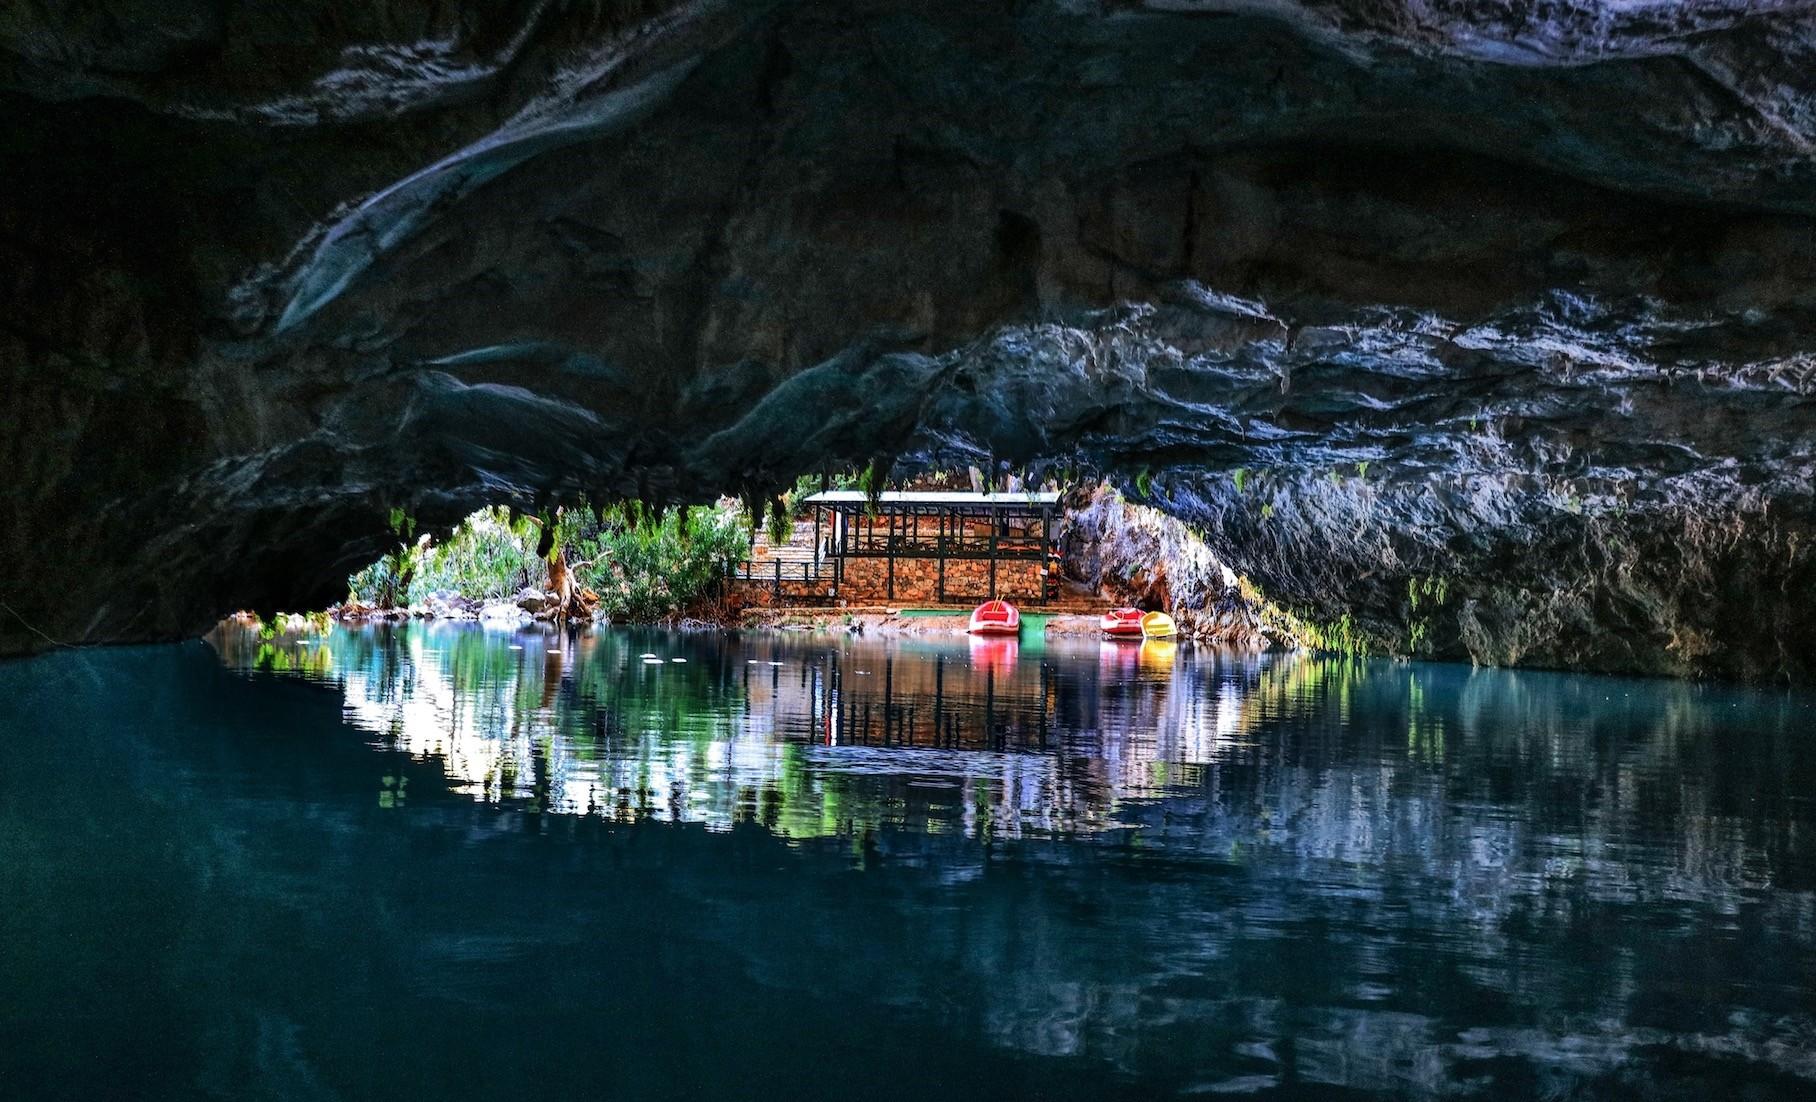 Altu0131nbeu015fik Cave in Antalyau2019s Akseki district